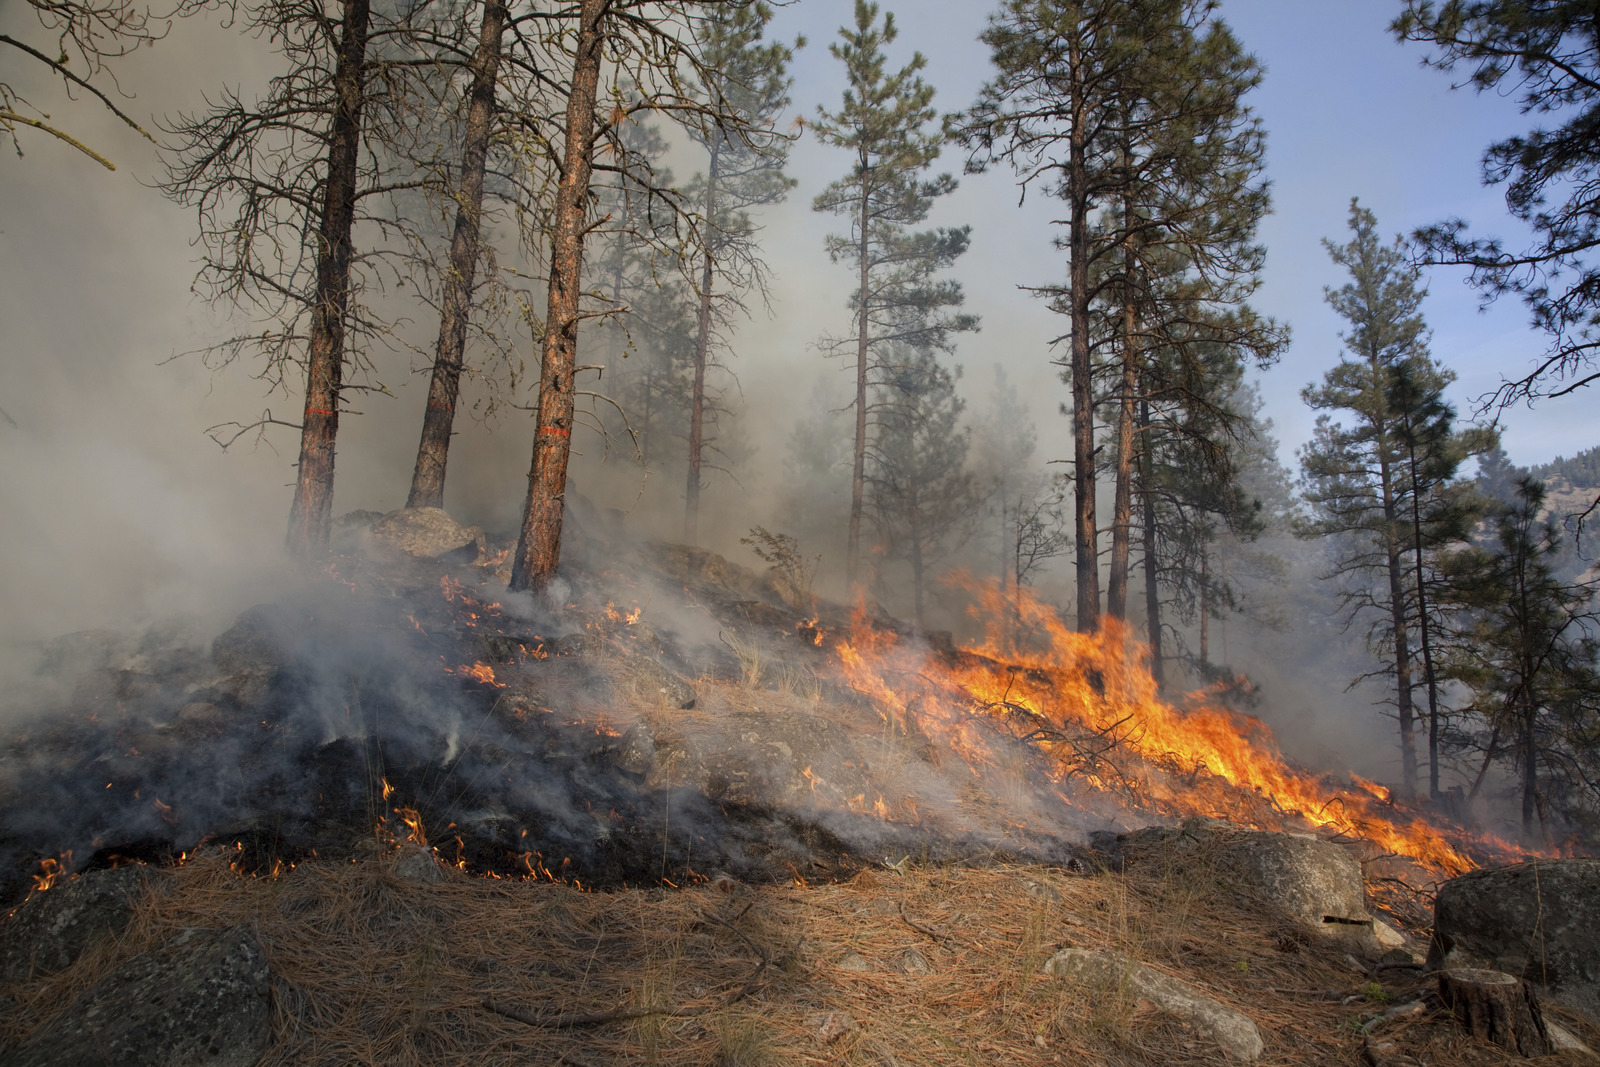 Prescribed fire in ponderosa pine forest in fall on Sinlahekin Wildlife Area in Okanogan County. Photo by John Marshall.